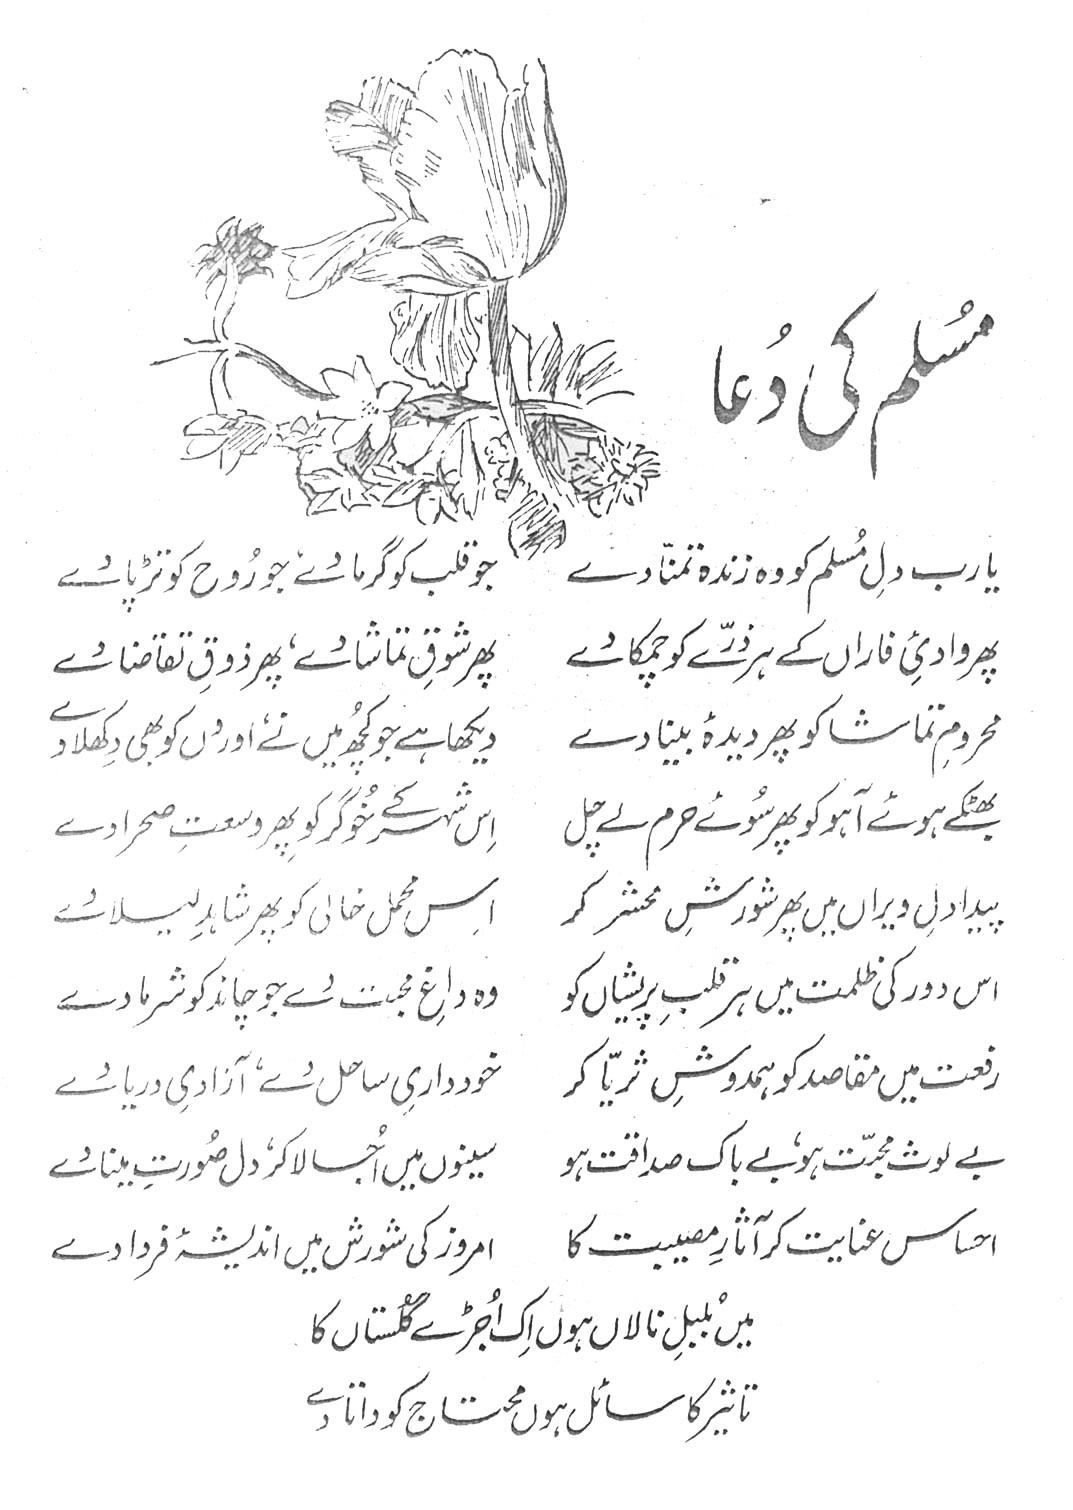 012 Essay Example Harkat Mein Barkat In Urdu Amazing On Topic Hai Short Full